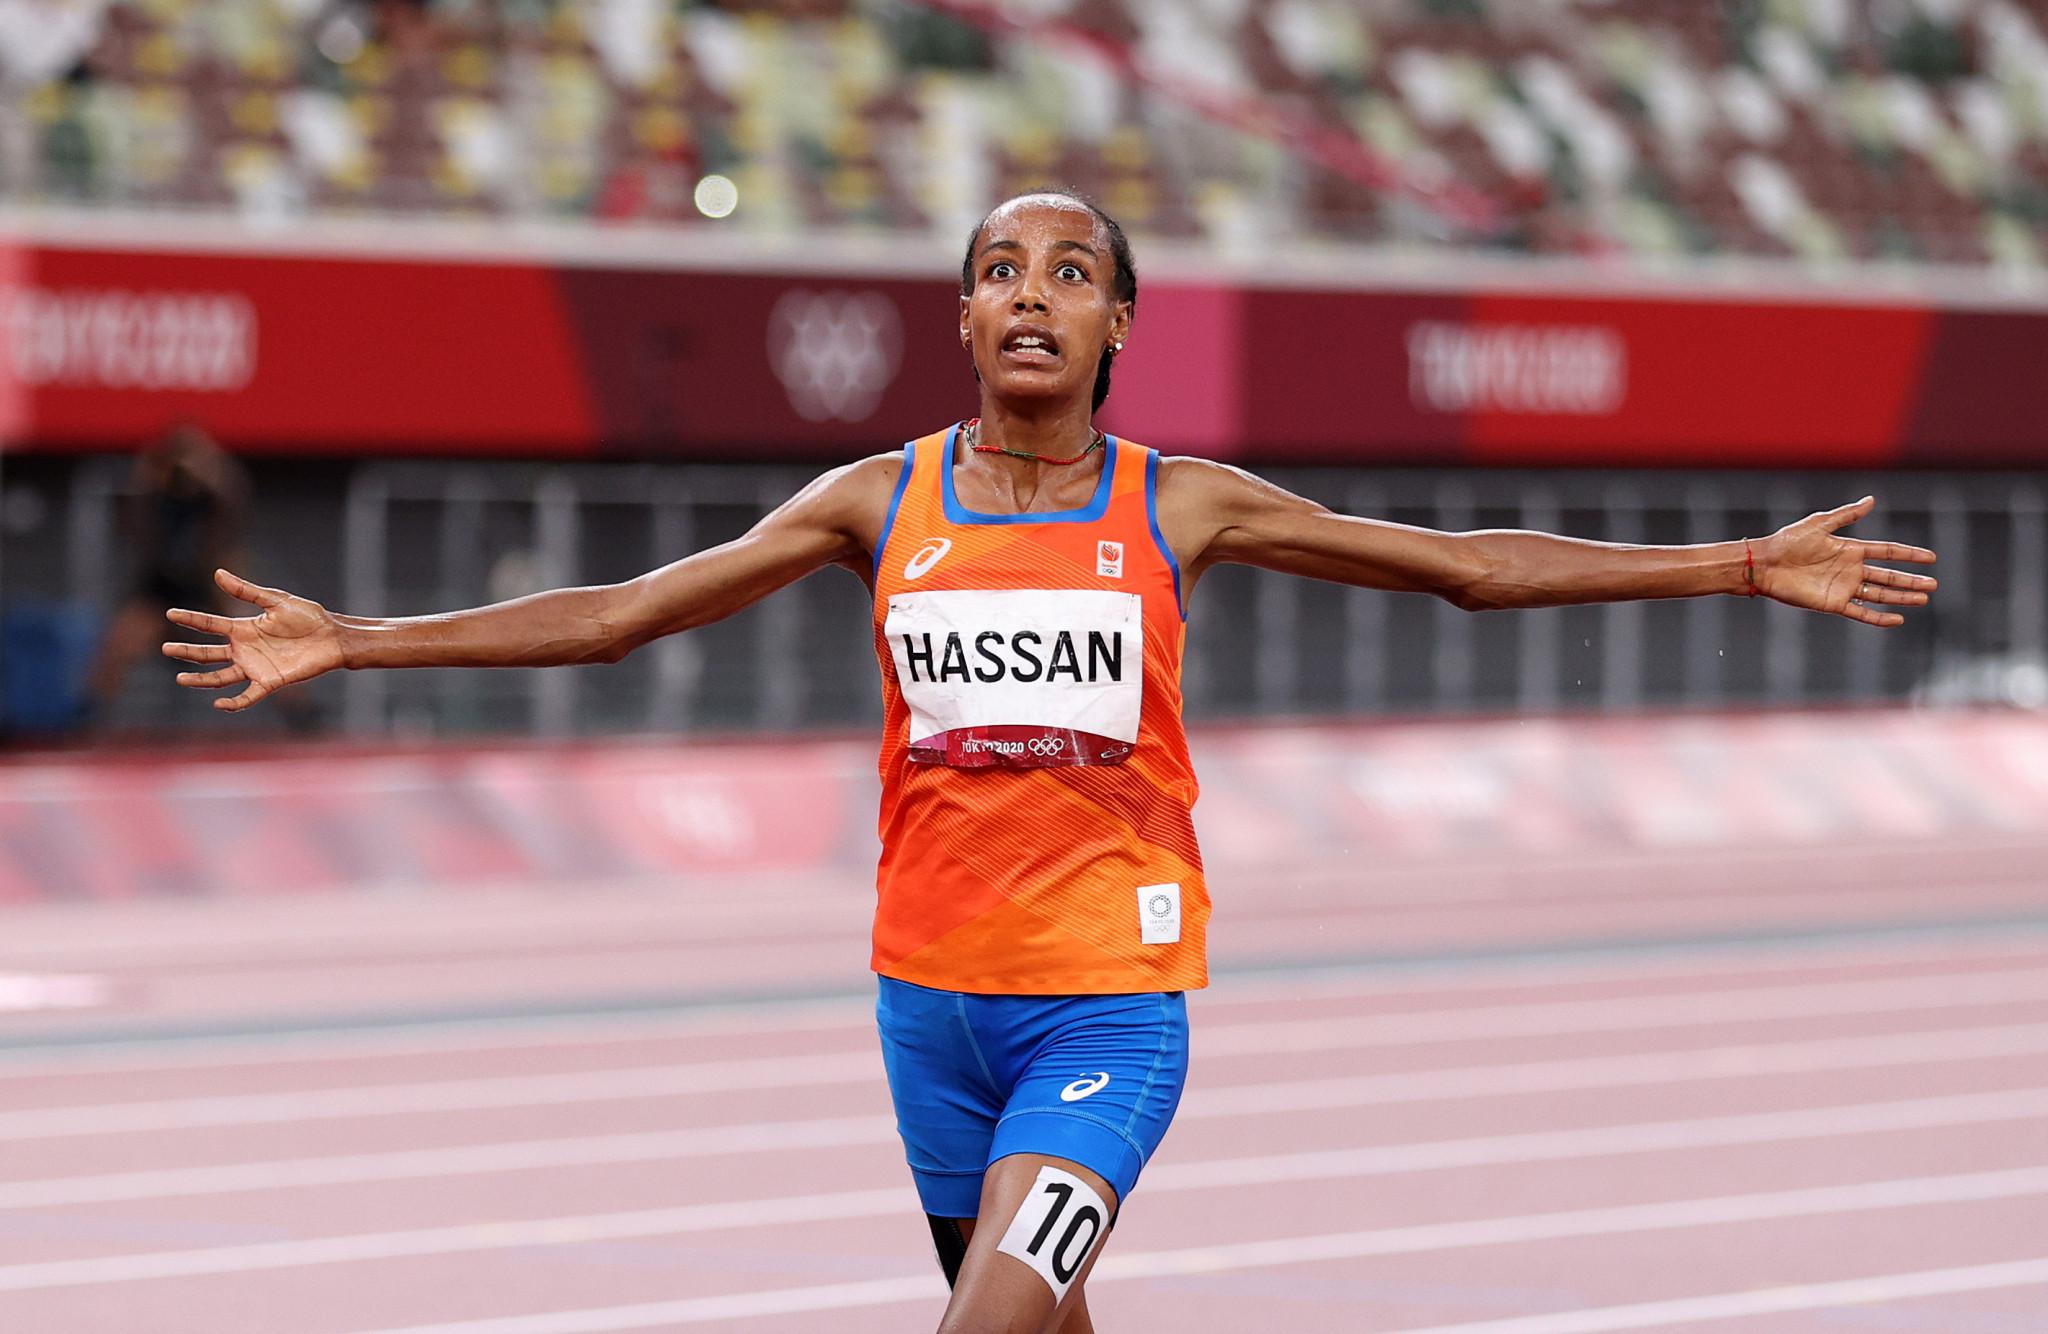 Hassan's 5,000m world record bid to presage Eugene Diamond League meeting